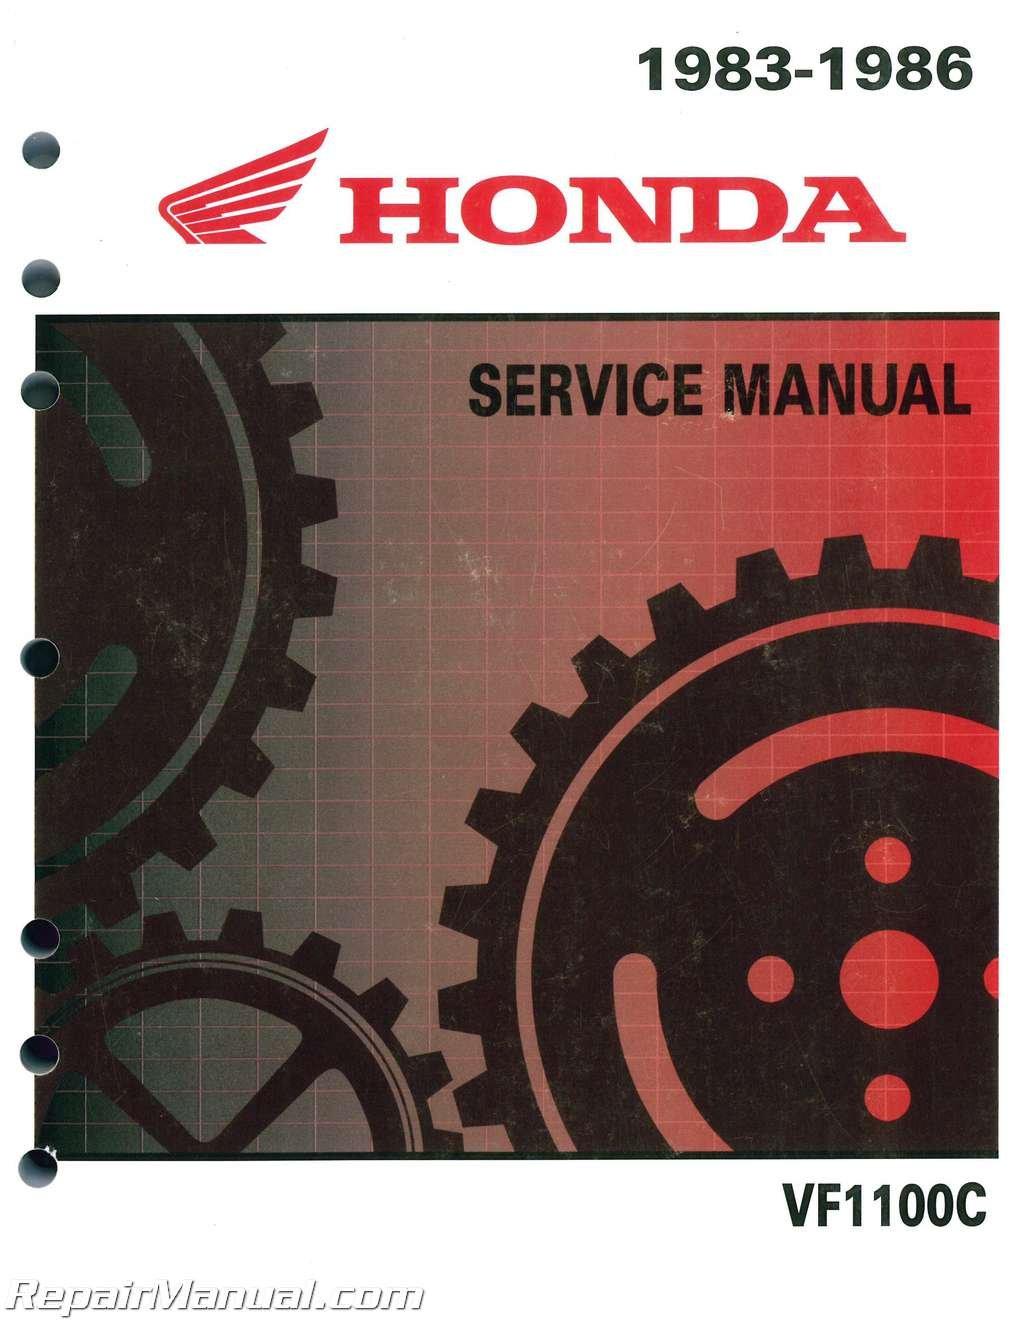 61MB403 VF1100C Magna V65 Honda Motorcycle Service Manual 1983-1986:  Manufacturer: Amazon.com: Books